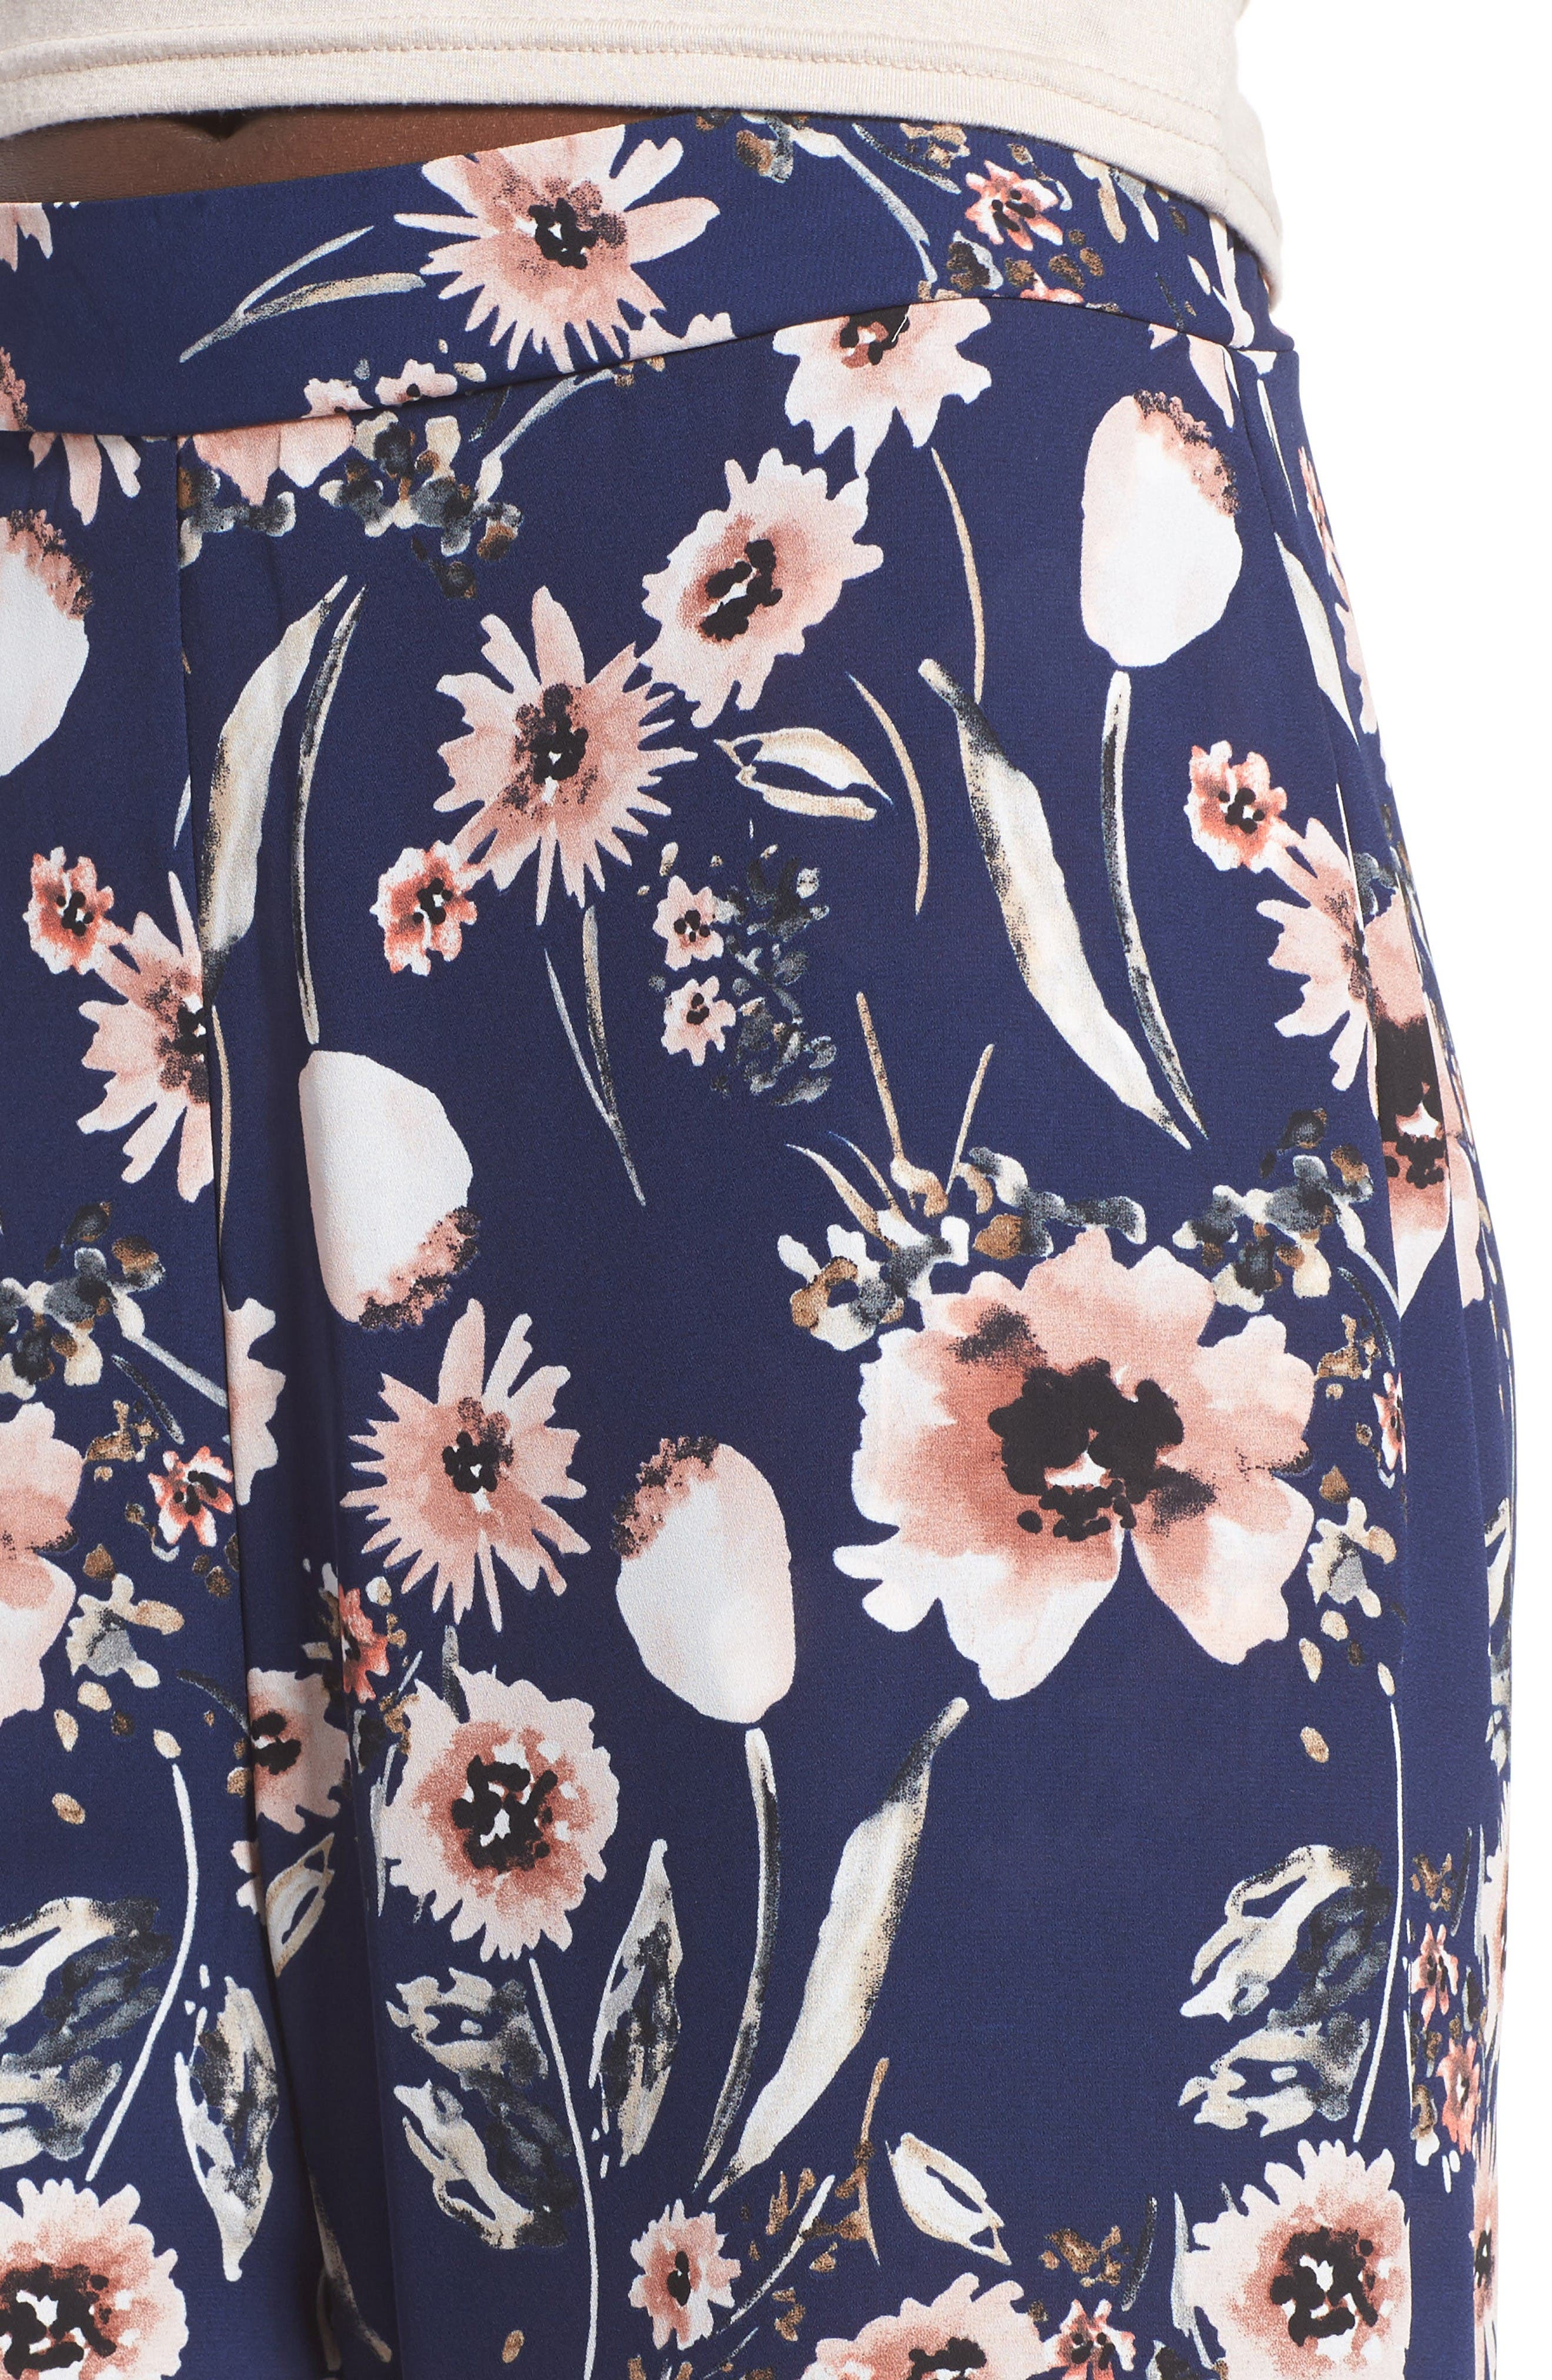 Wide Leg Pants,                             Alternate thumbnail 4, color,                             Navy Medieval Multi Floral